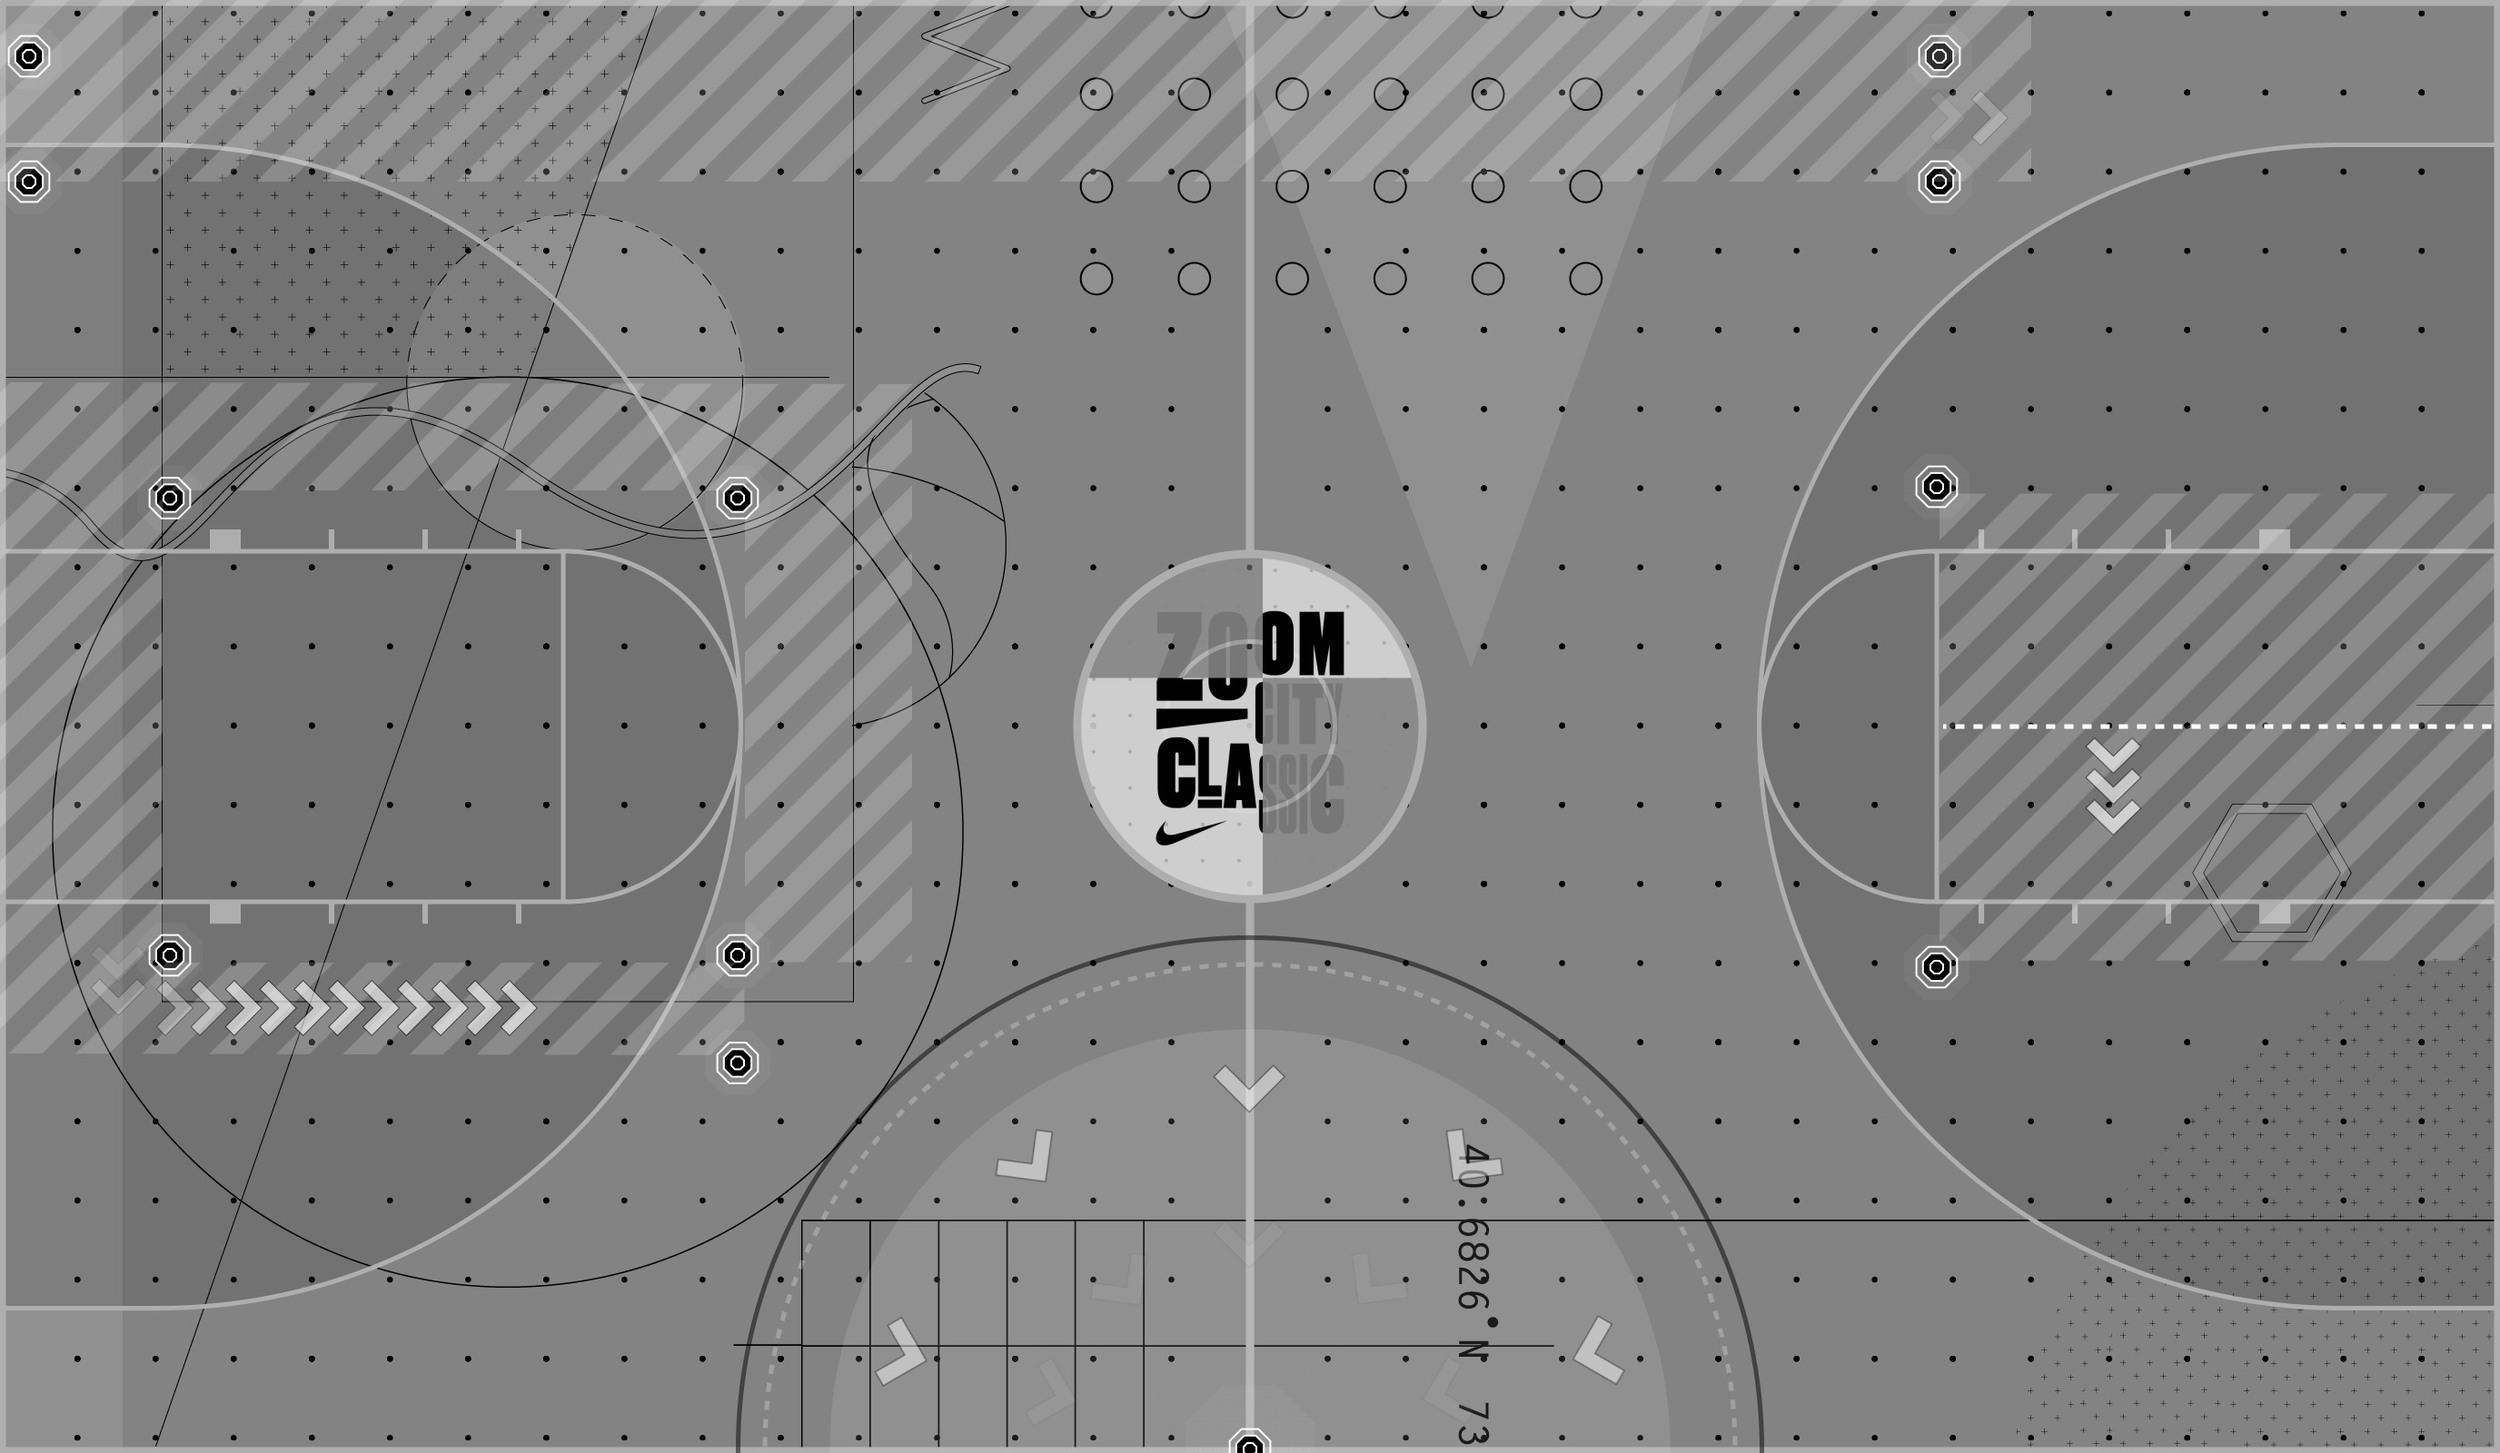 NZC_New+Court+Layout_04.jpg